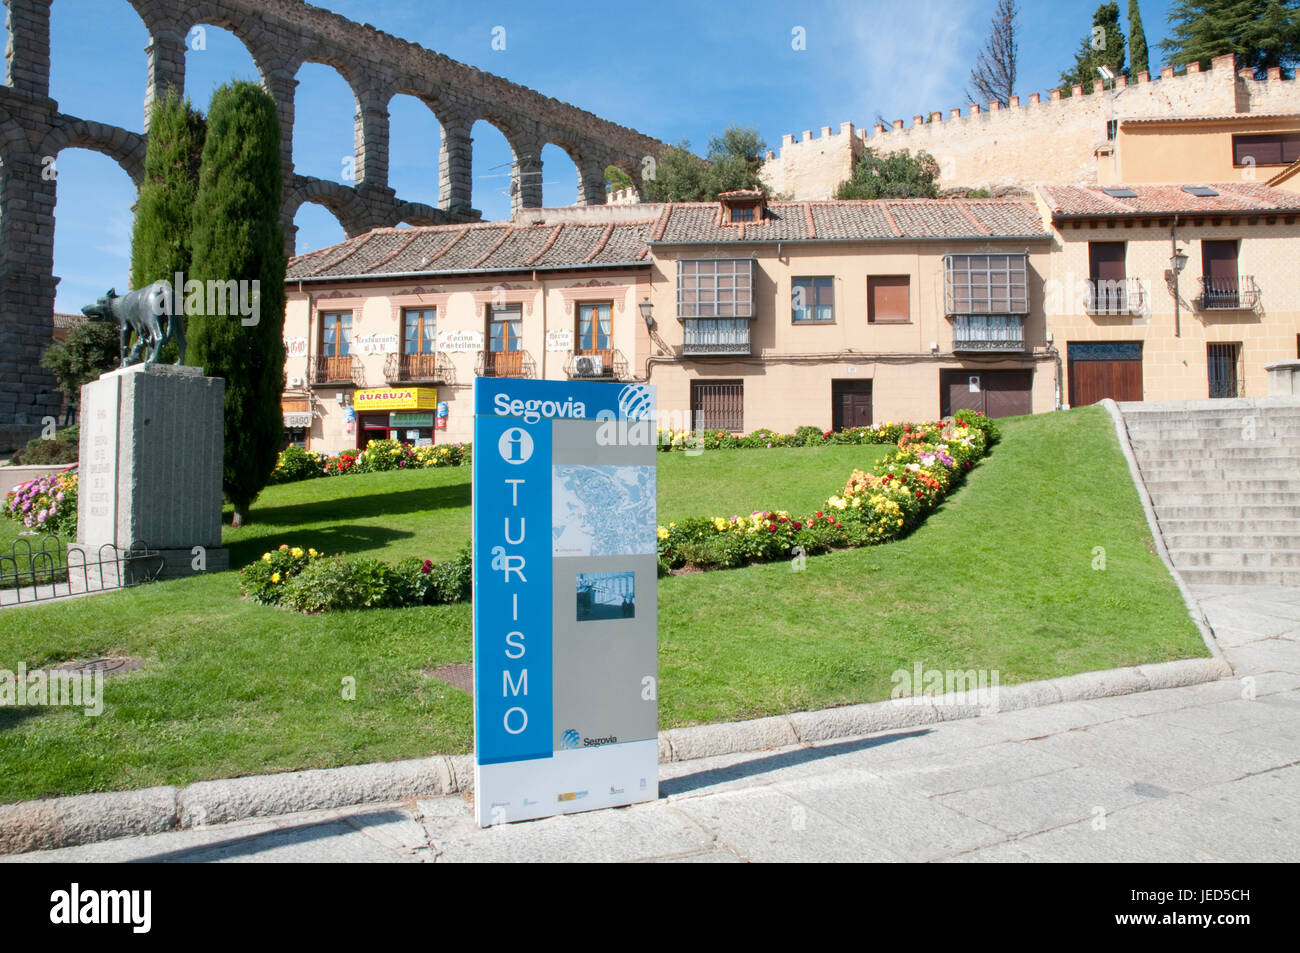 Tourist information and Roman aqueduct. Segovia, Spain. - Stock Image